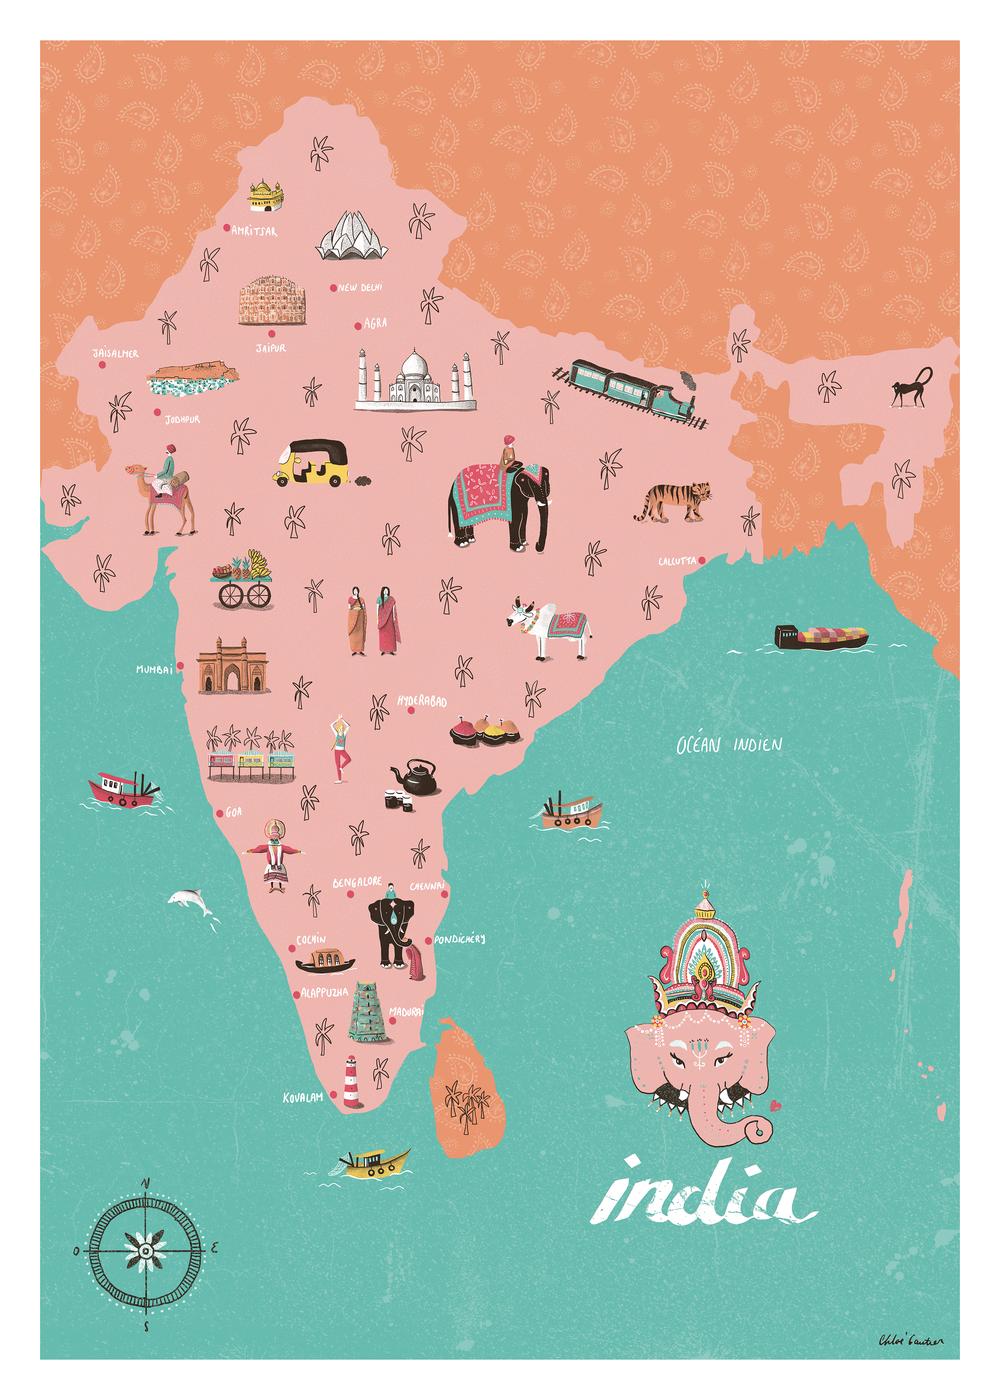 indiaa.png